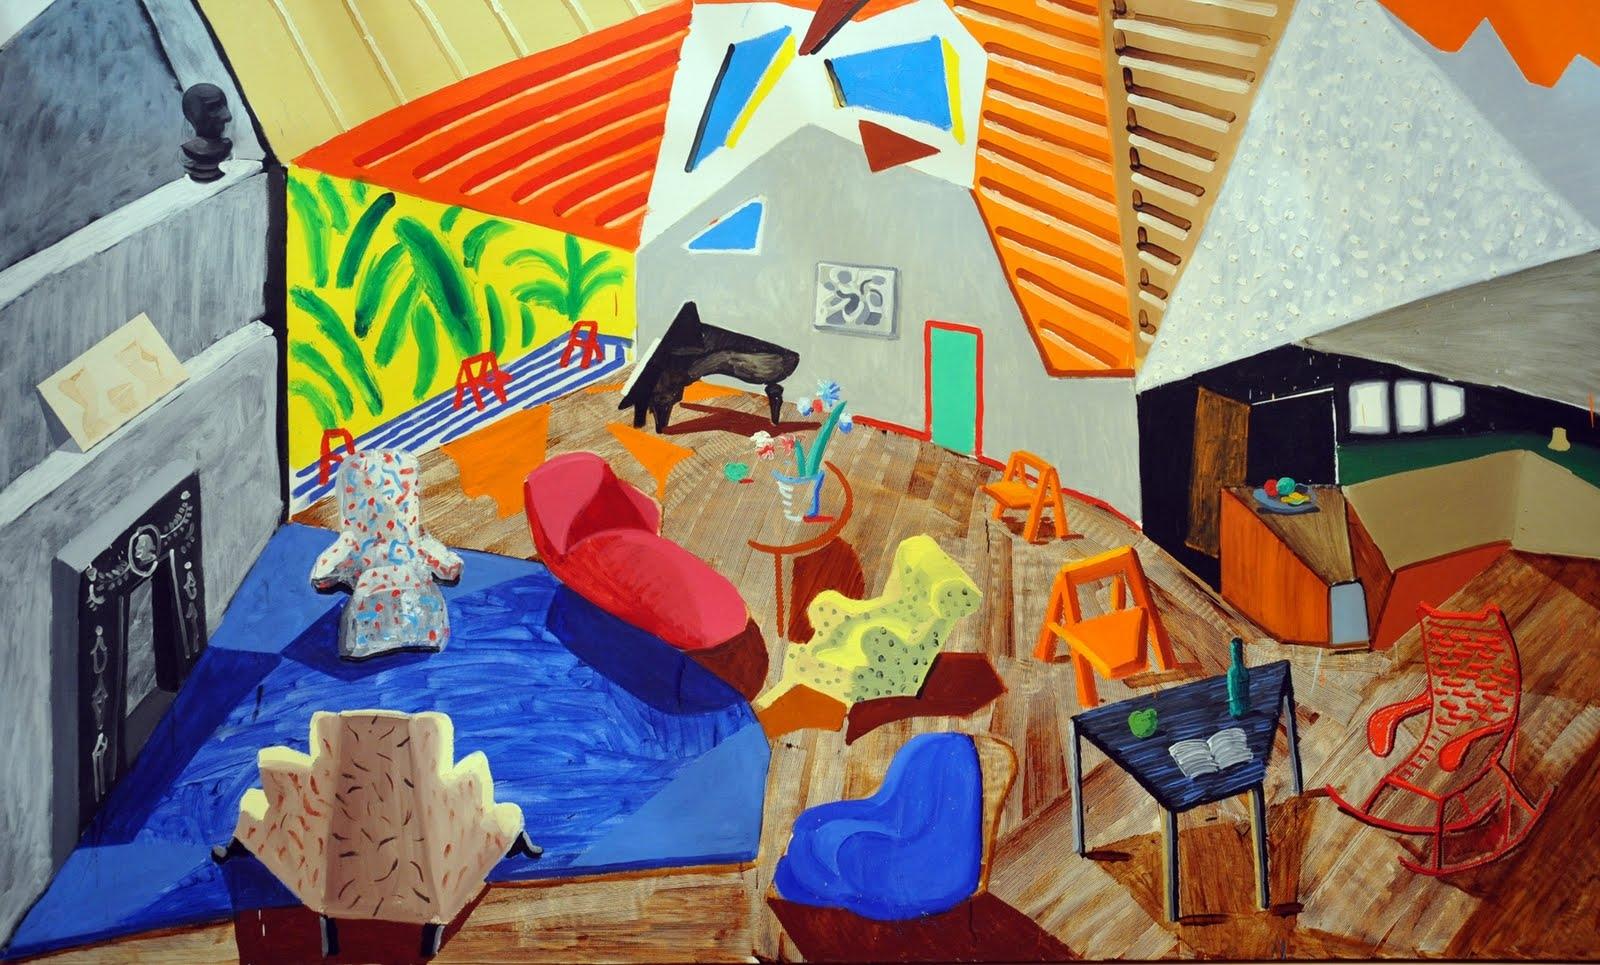 David+Hockney+-+Large+Interior%2C+Los+Angeles+%281988%29.jpg